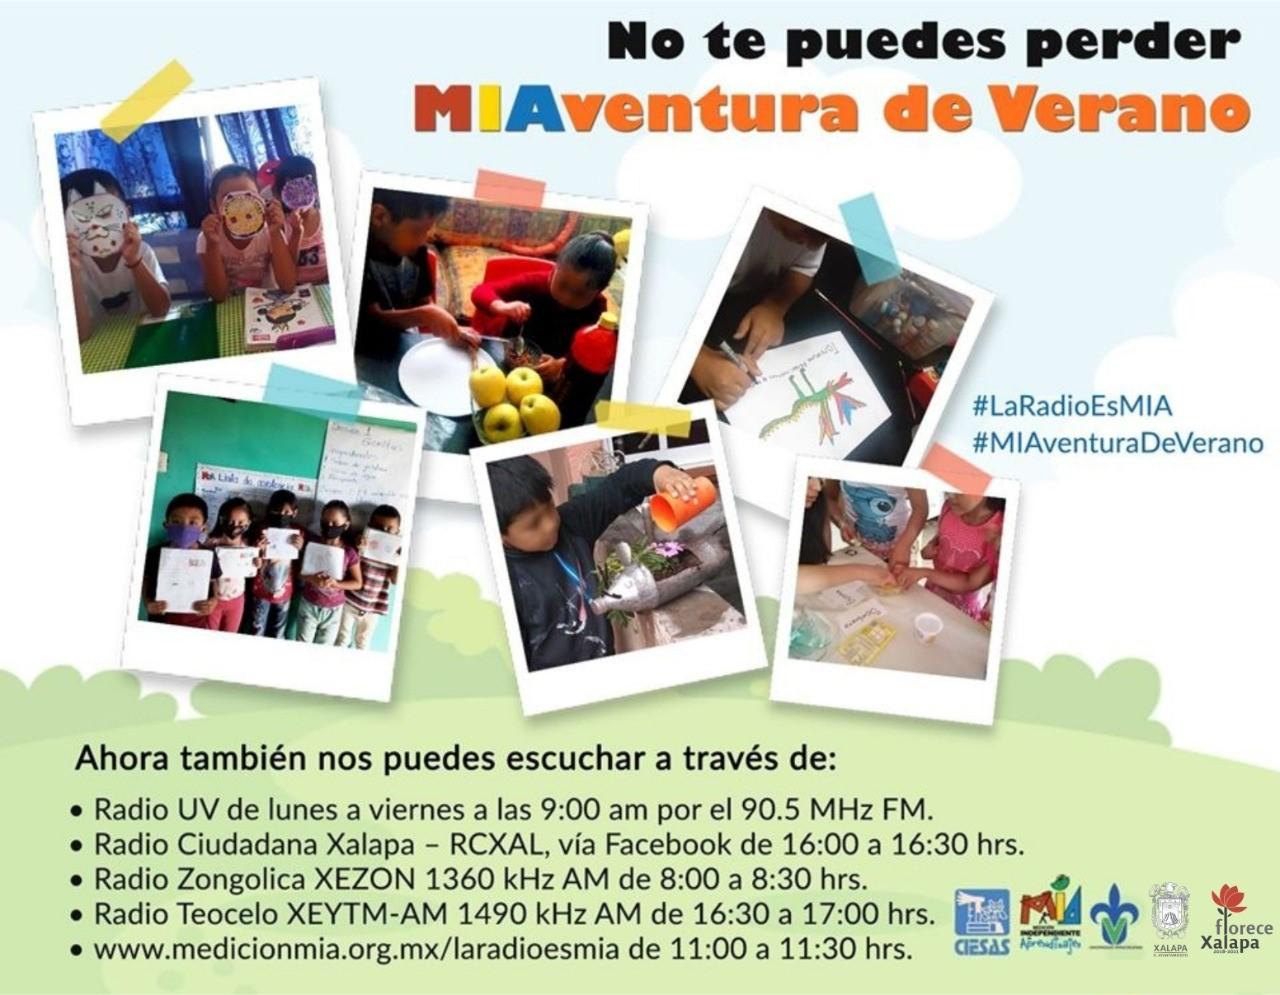 En Radio Ciudadana Xalapa, MIAventura de Verano